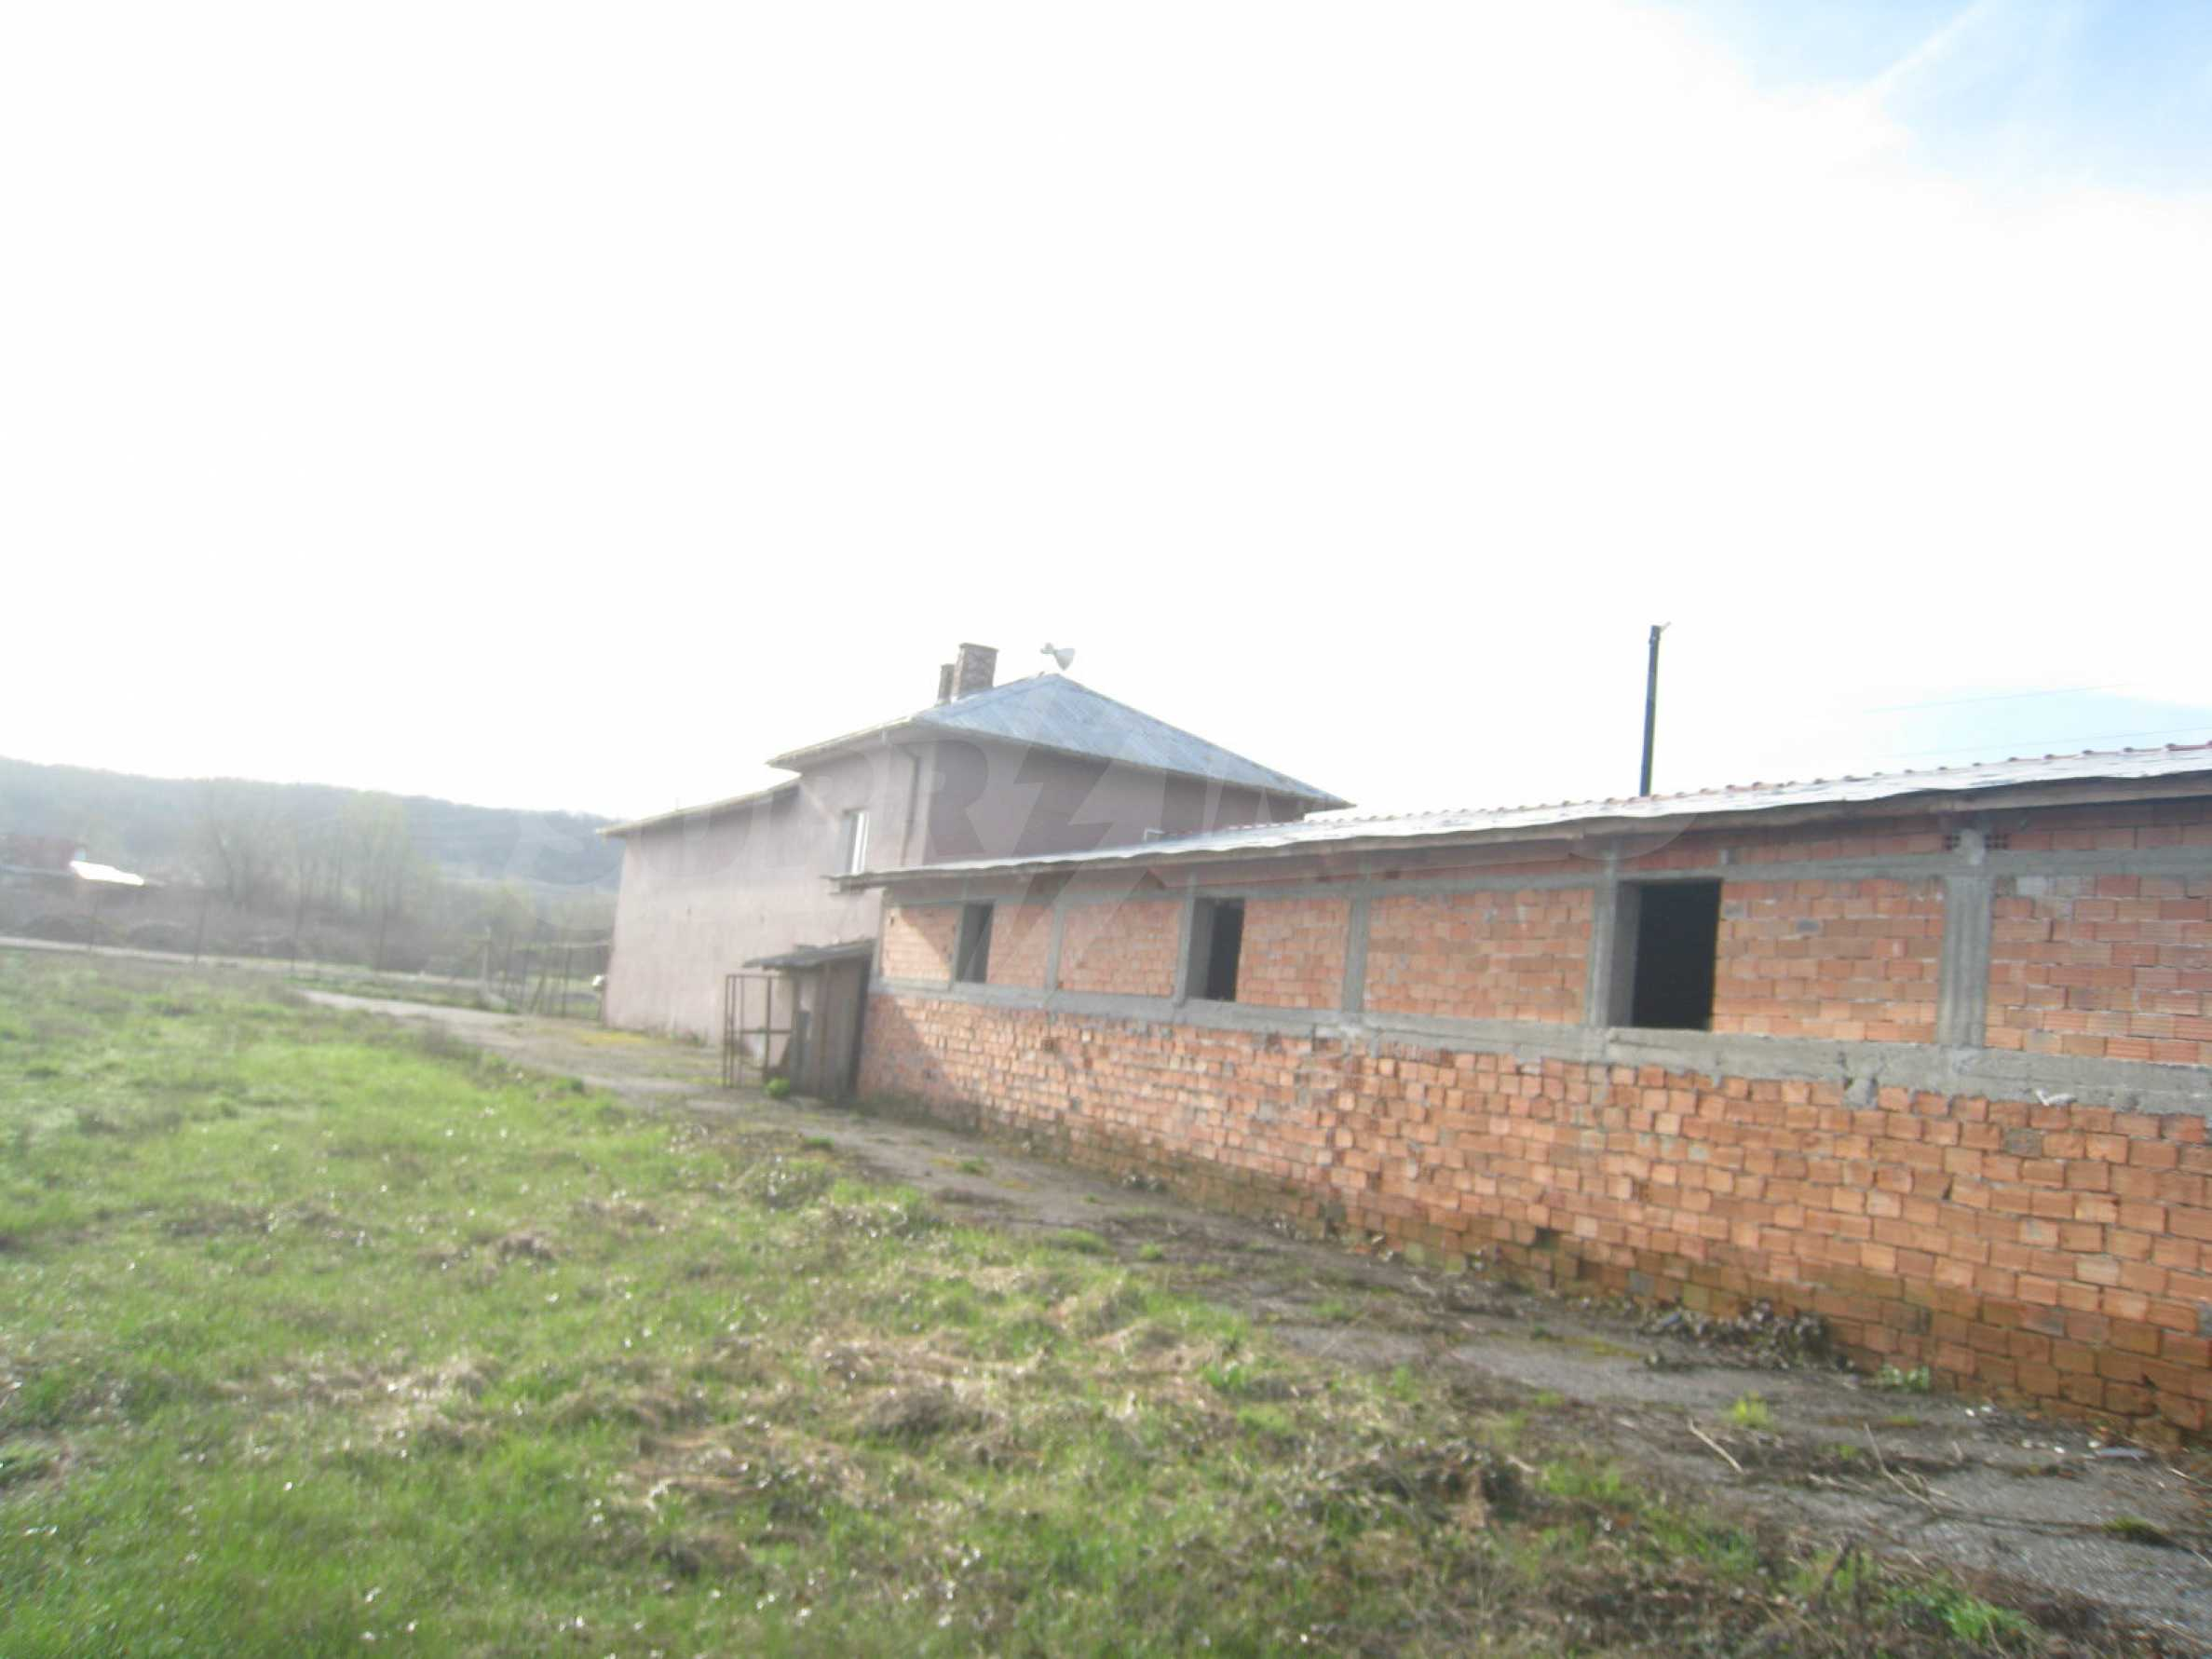 Fishpond, warehouses, residential areas and asphalt ground near Montana 28